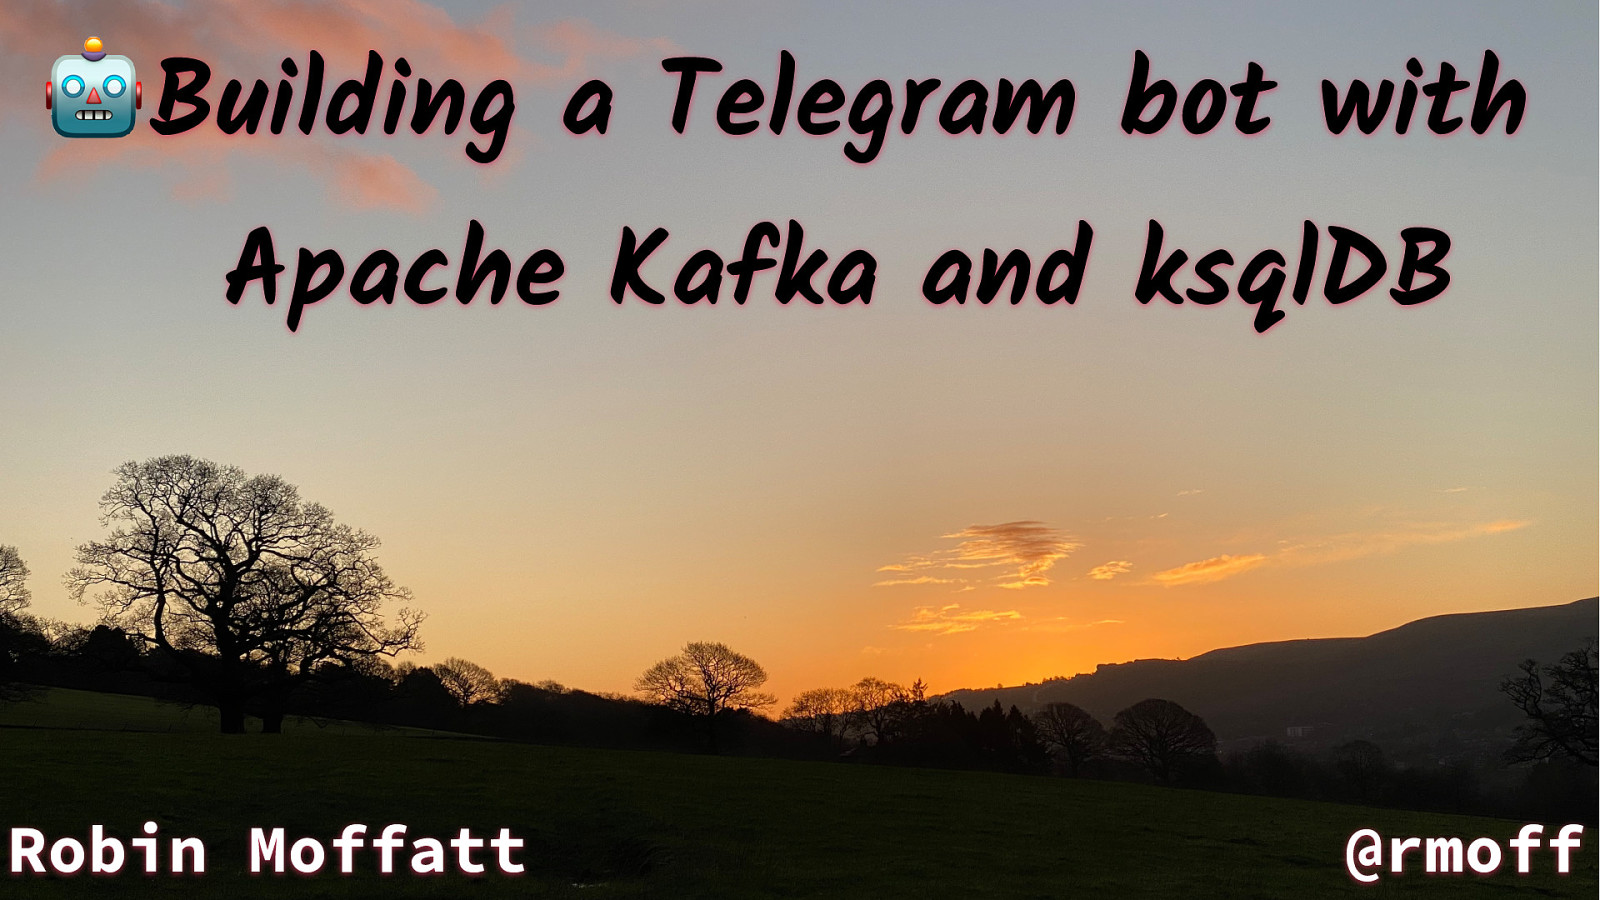 🤖 Building a Telegram bot with Apache Kafka and ksqlDB